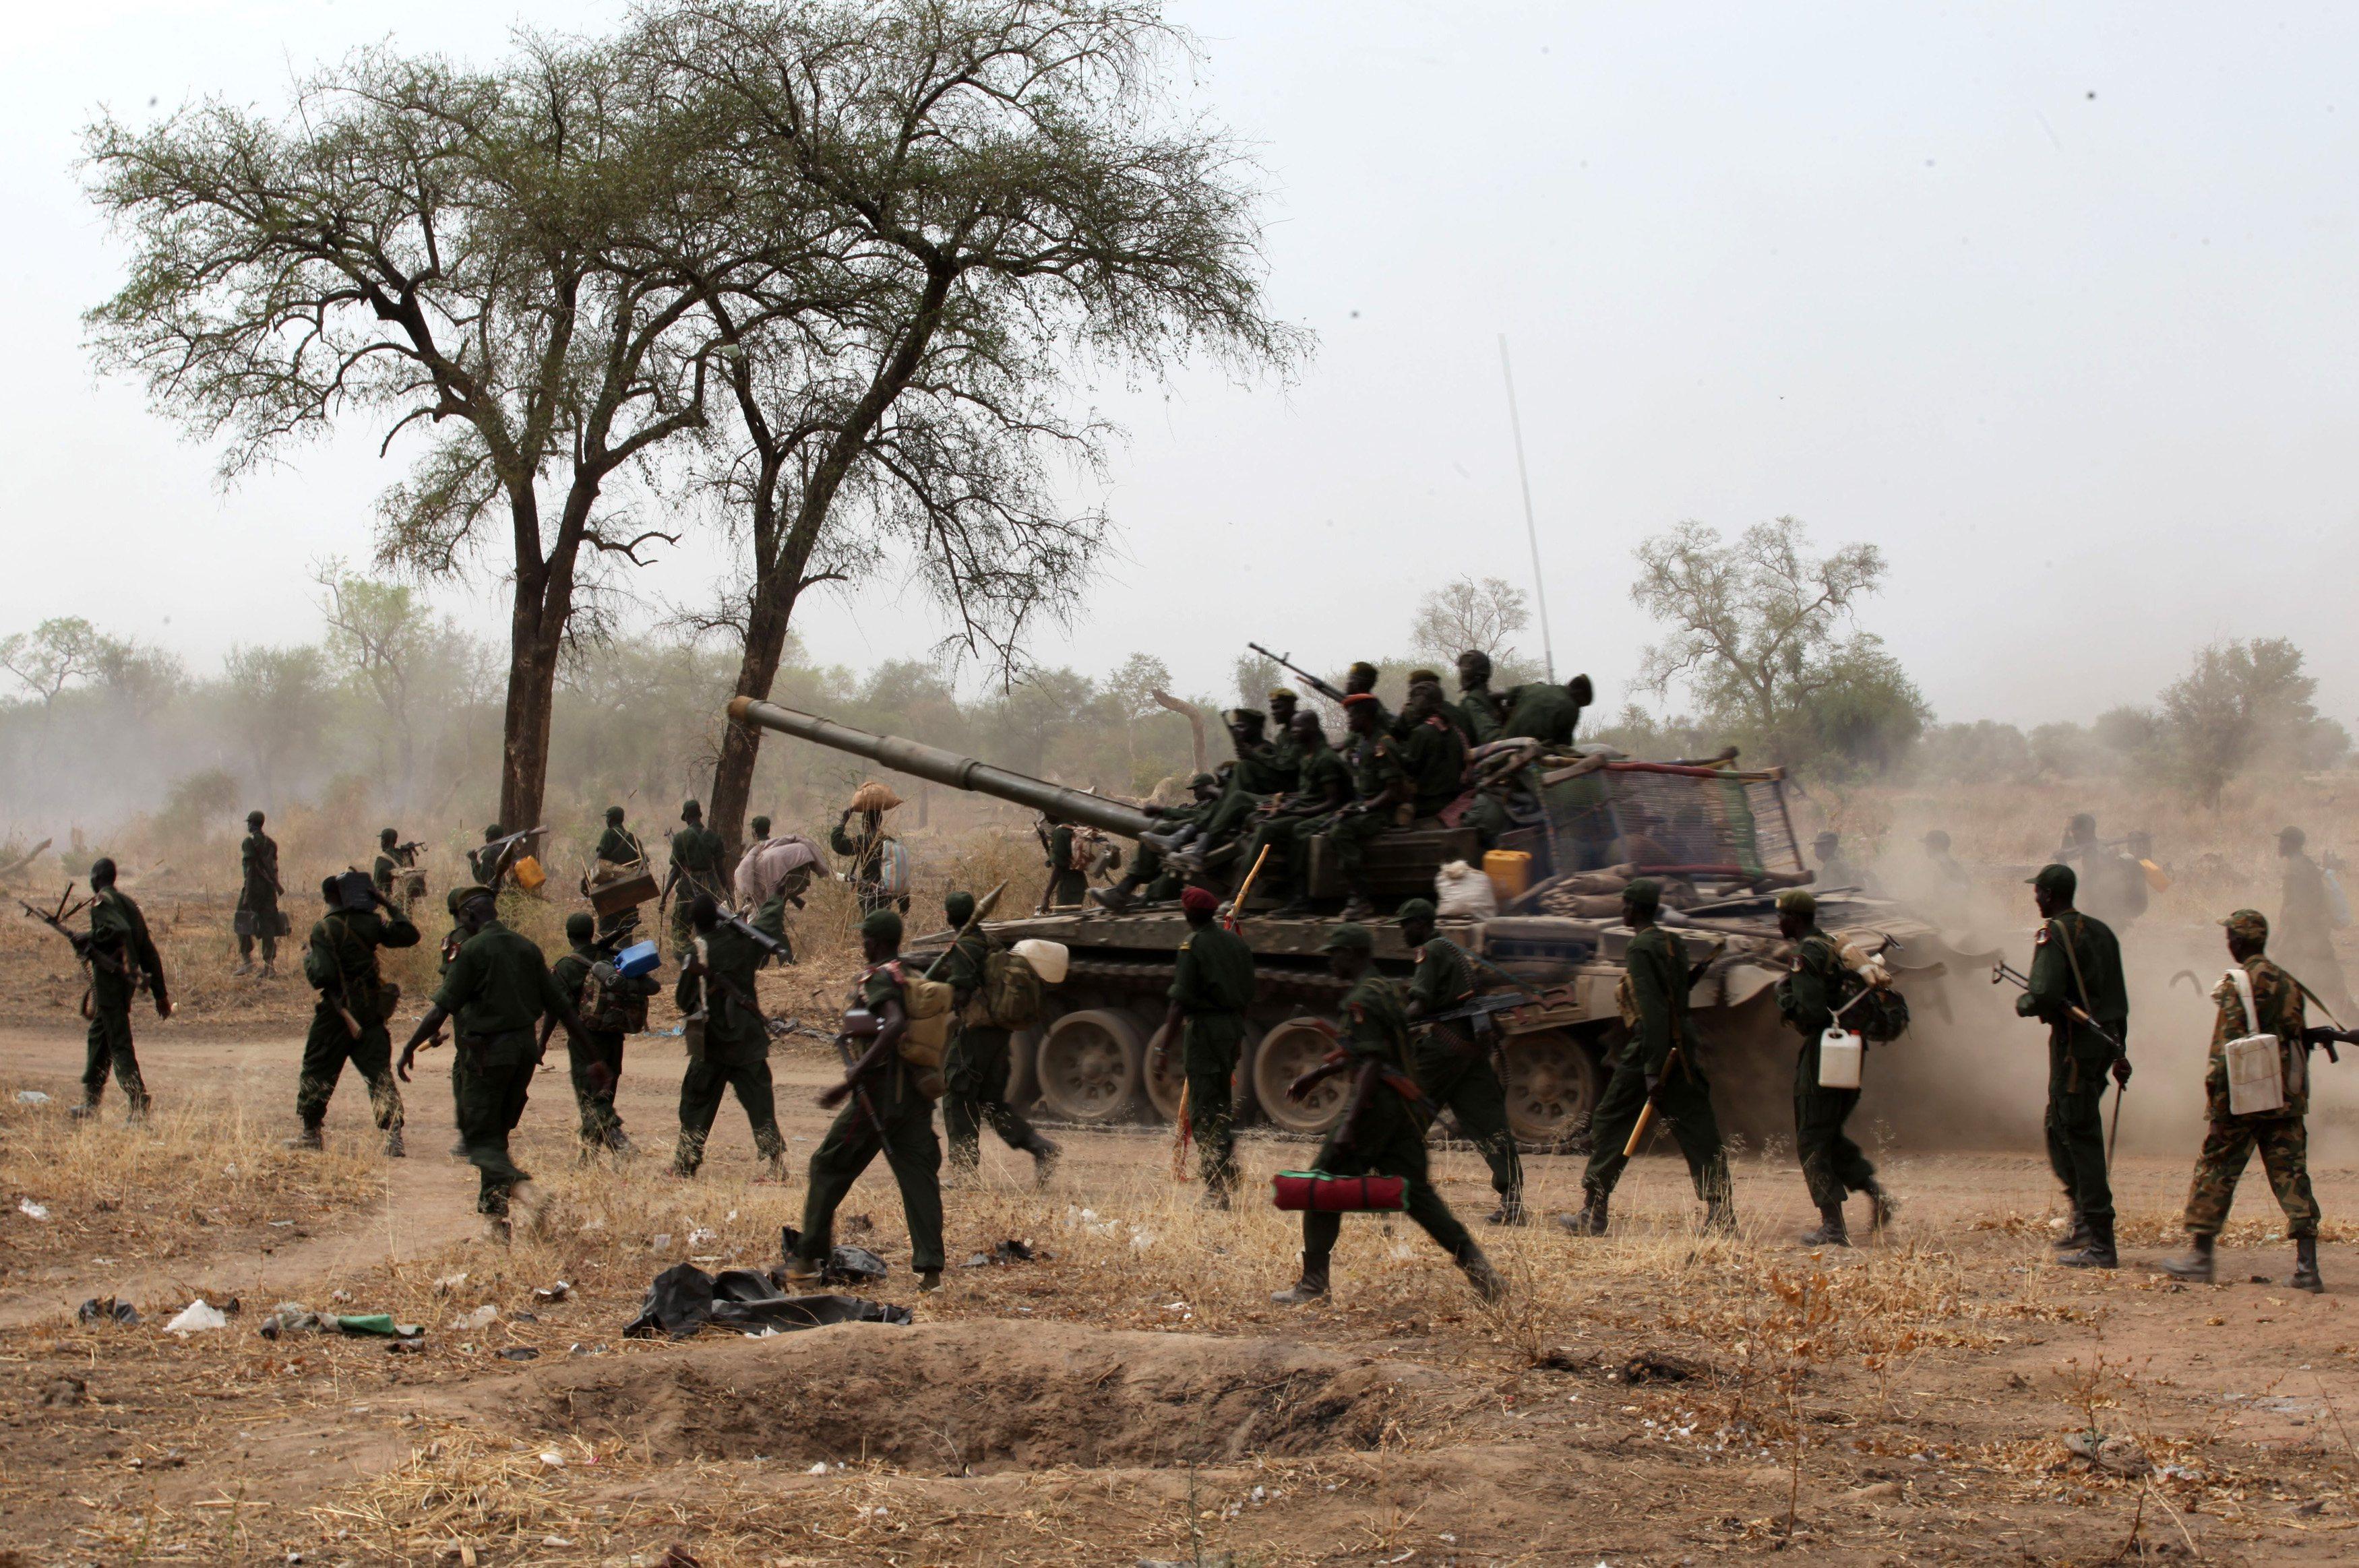 Ugandan military kills 3 South Sudan soldiers in border crossfire